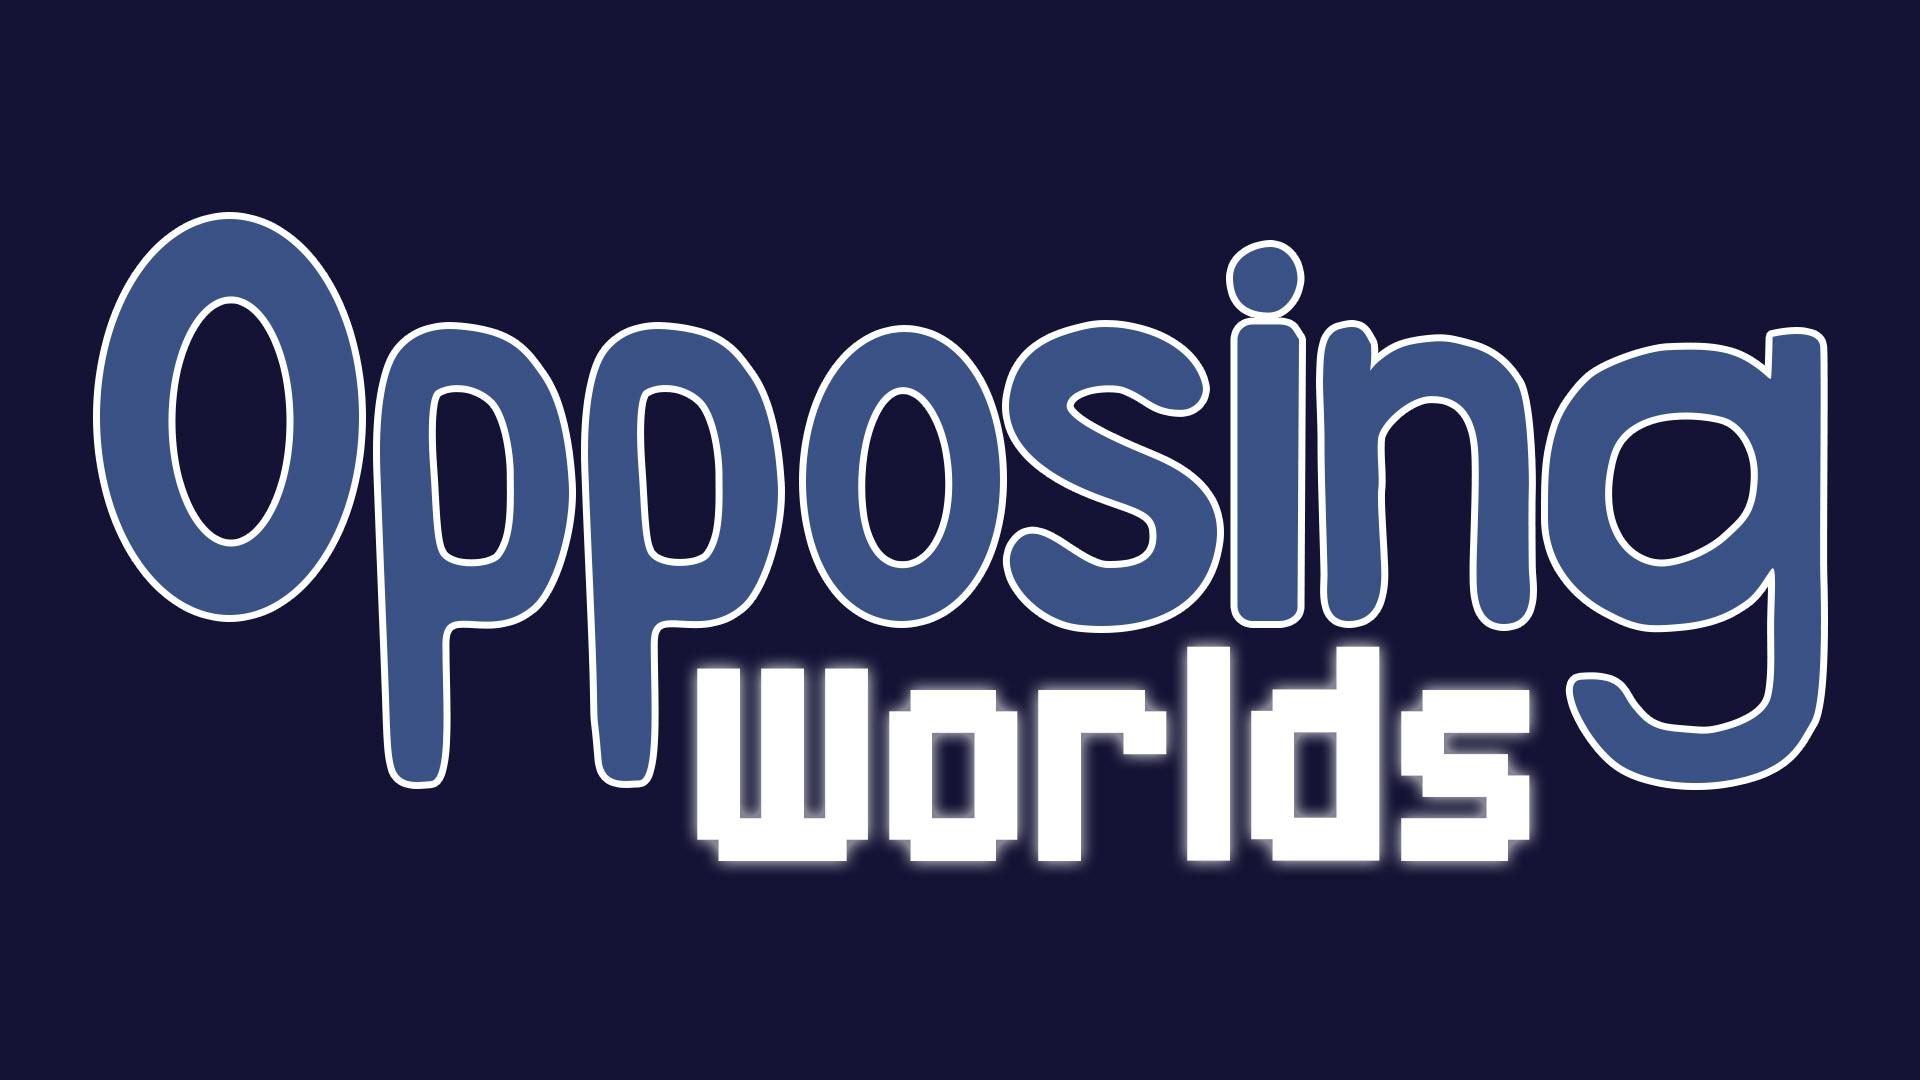 Opposing Worlds